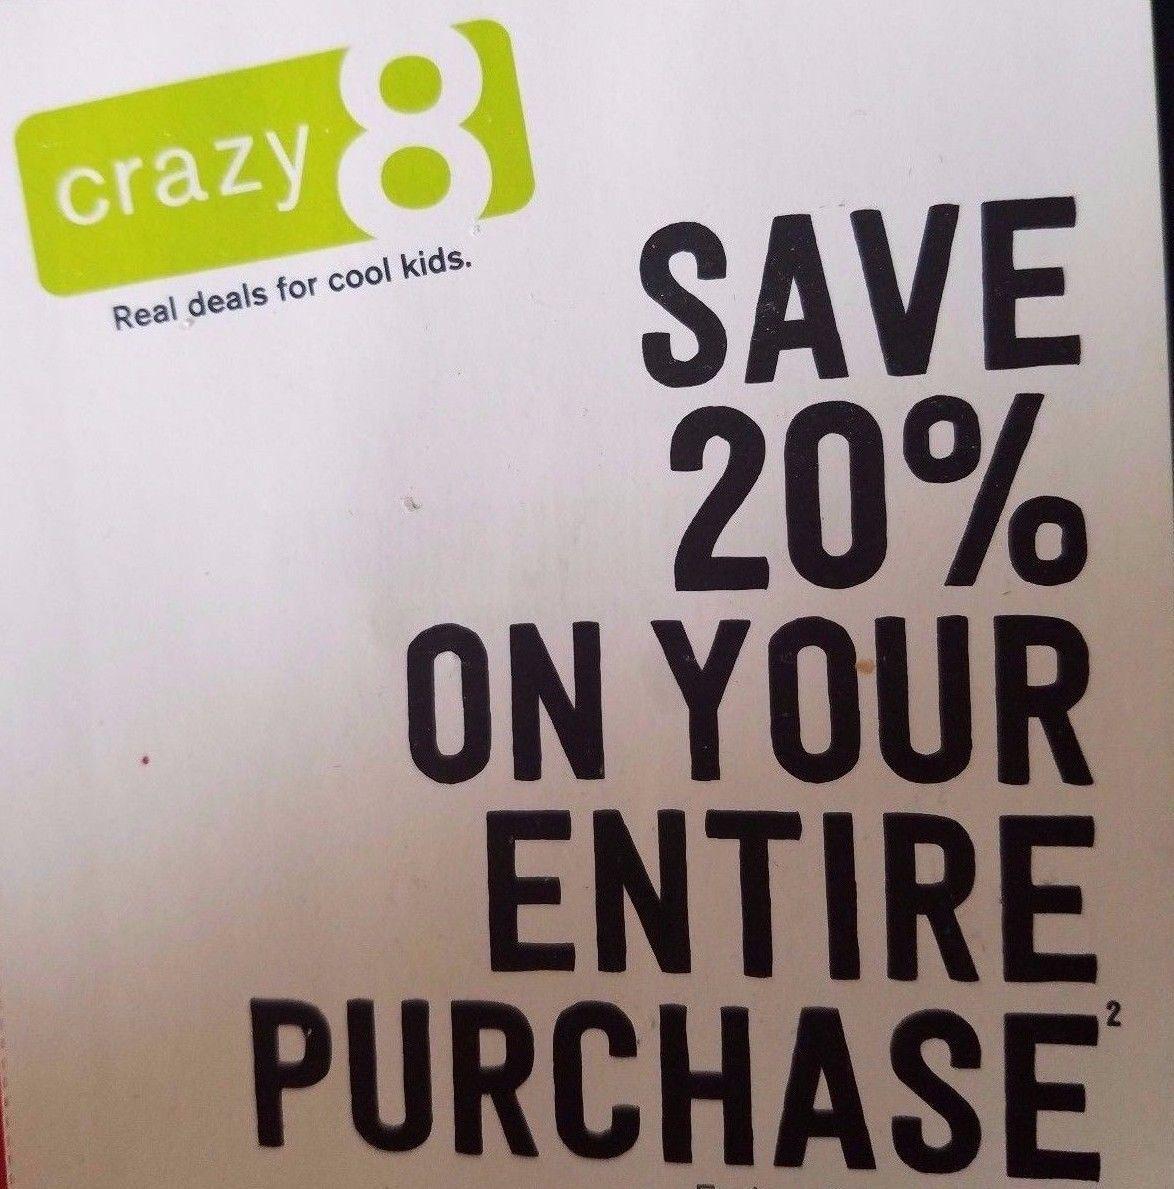 Crazy 8 20 Discount Off Entire Purchase Exp 1 2 2018 Coupon Https Auctionarray Com Shop Crazy 8 20 Discount Off Entire Purchas Discounted Crazy 8 Gift Card